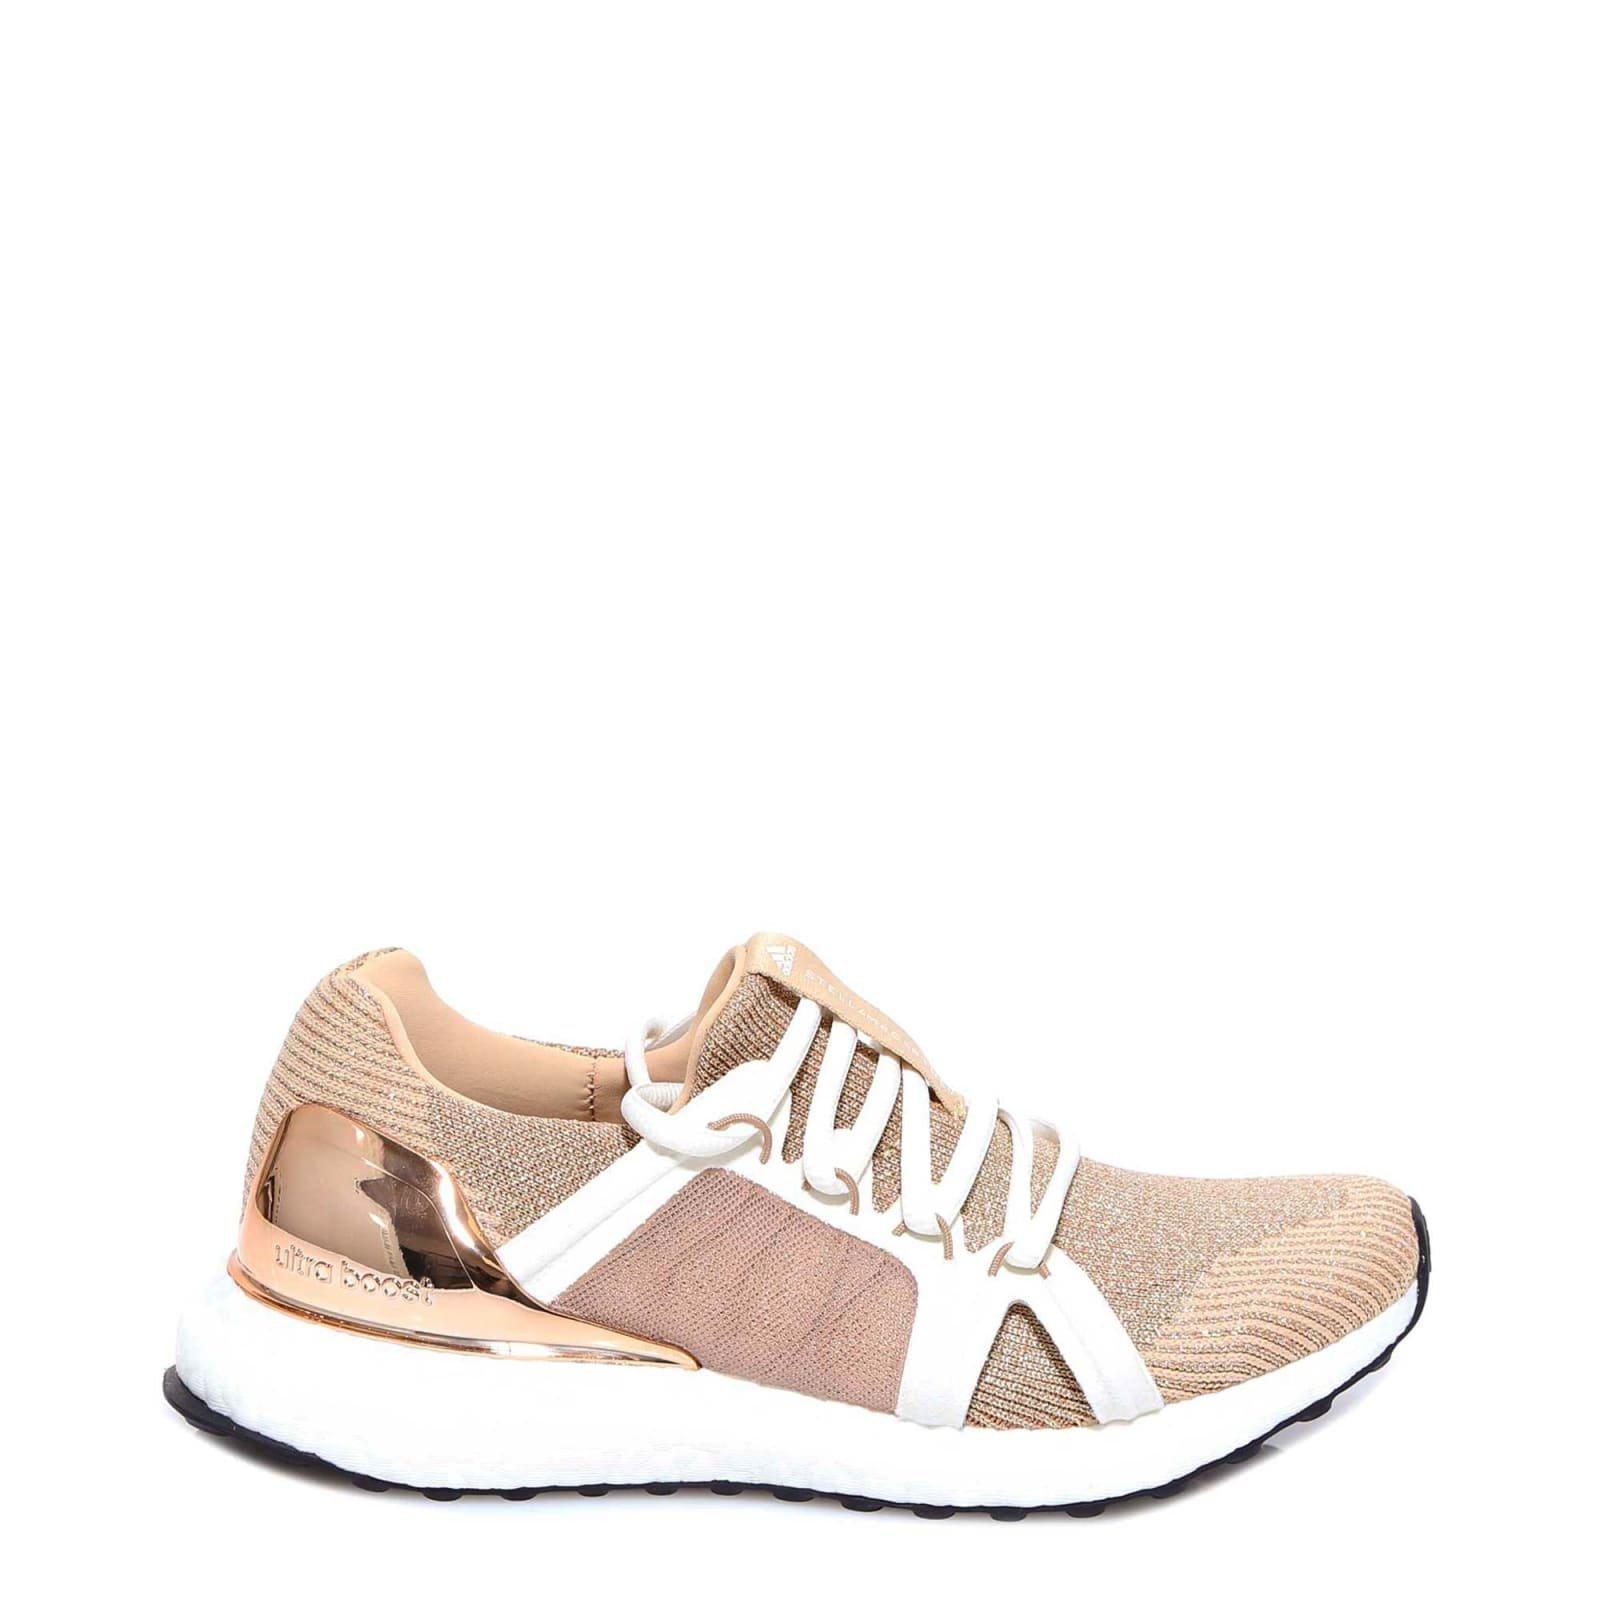 Adidas by Stella McCartney Ultra Boost S Sneakers